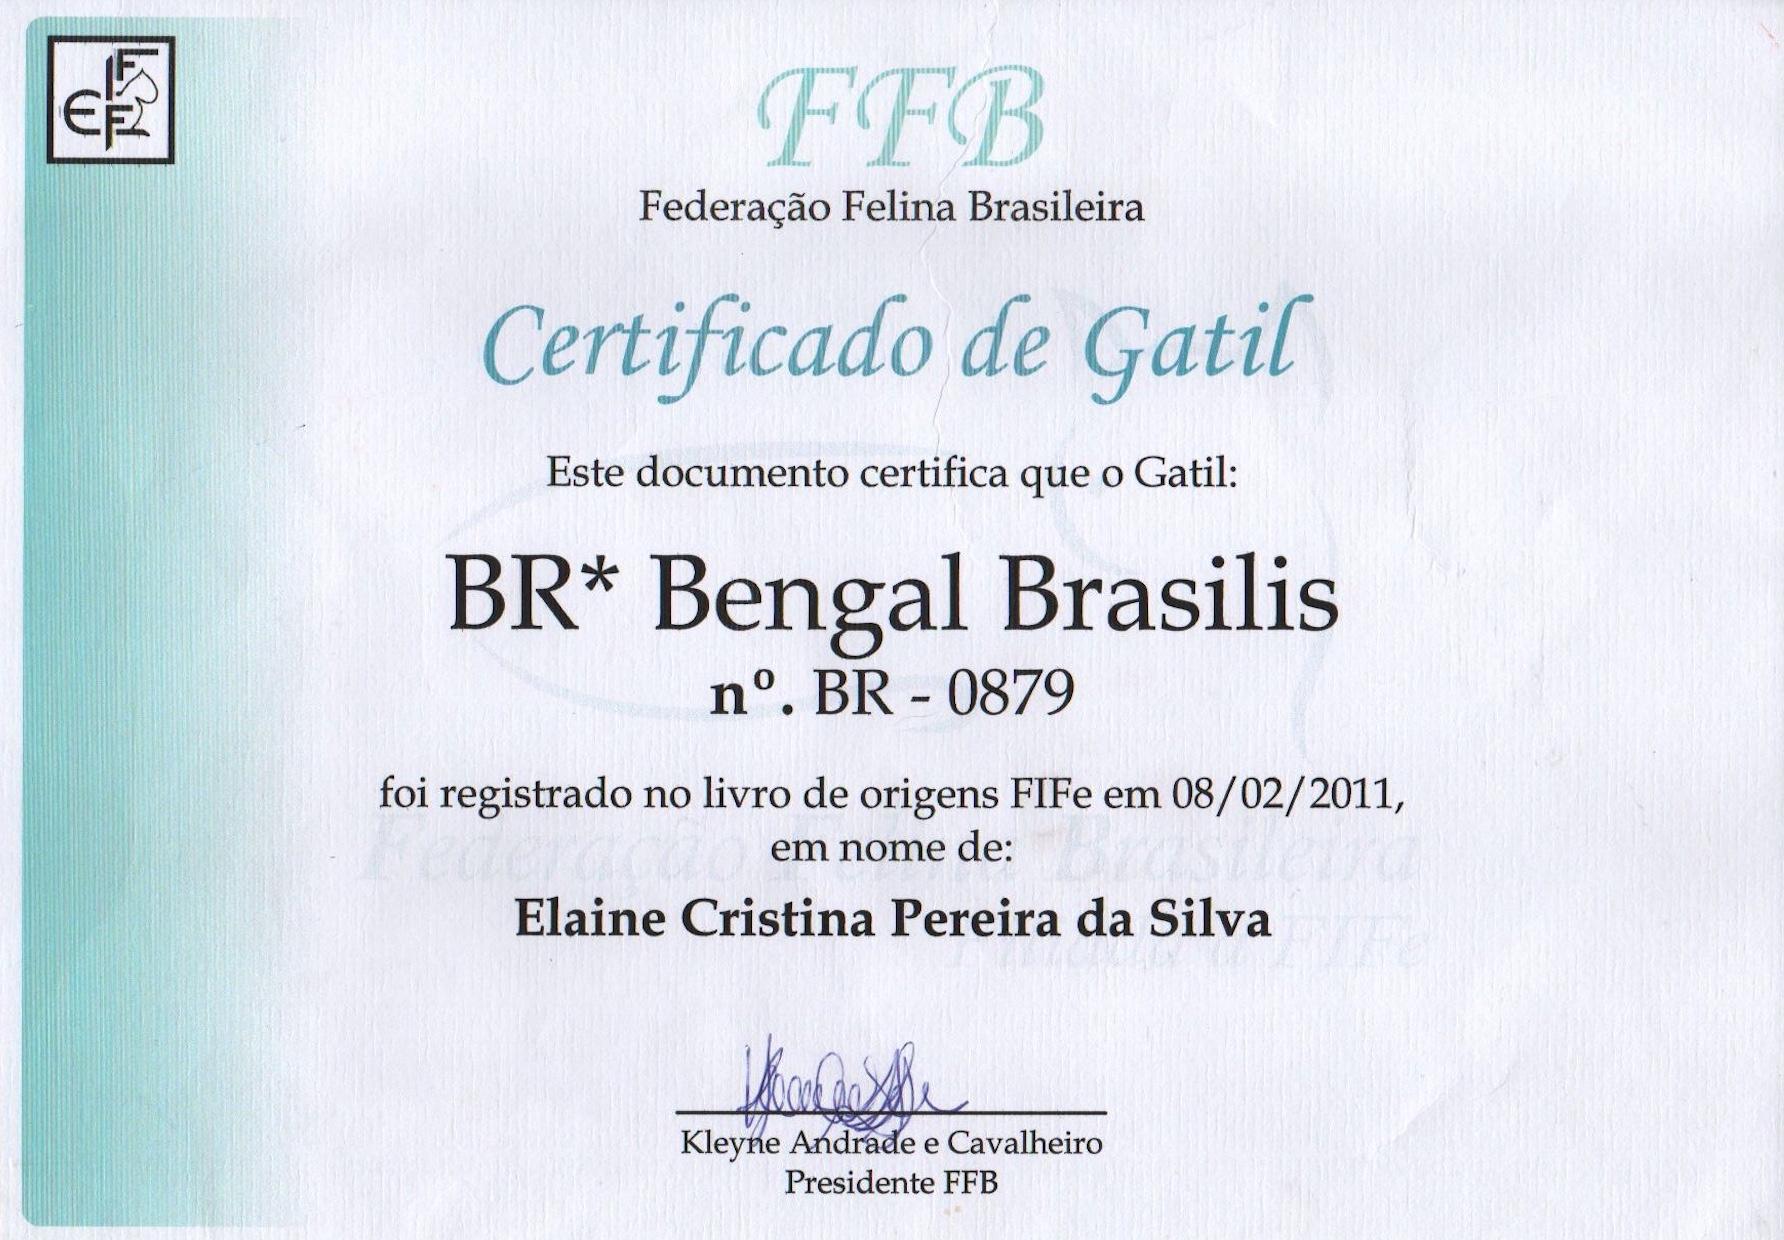 CBG Cattery Certificate.jpeg